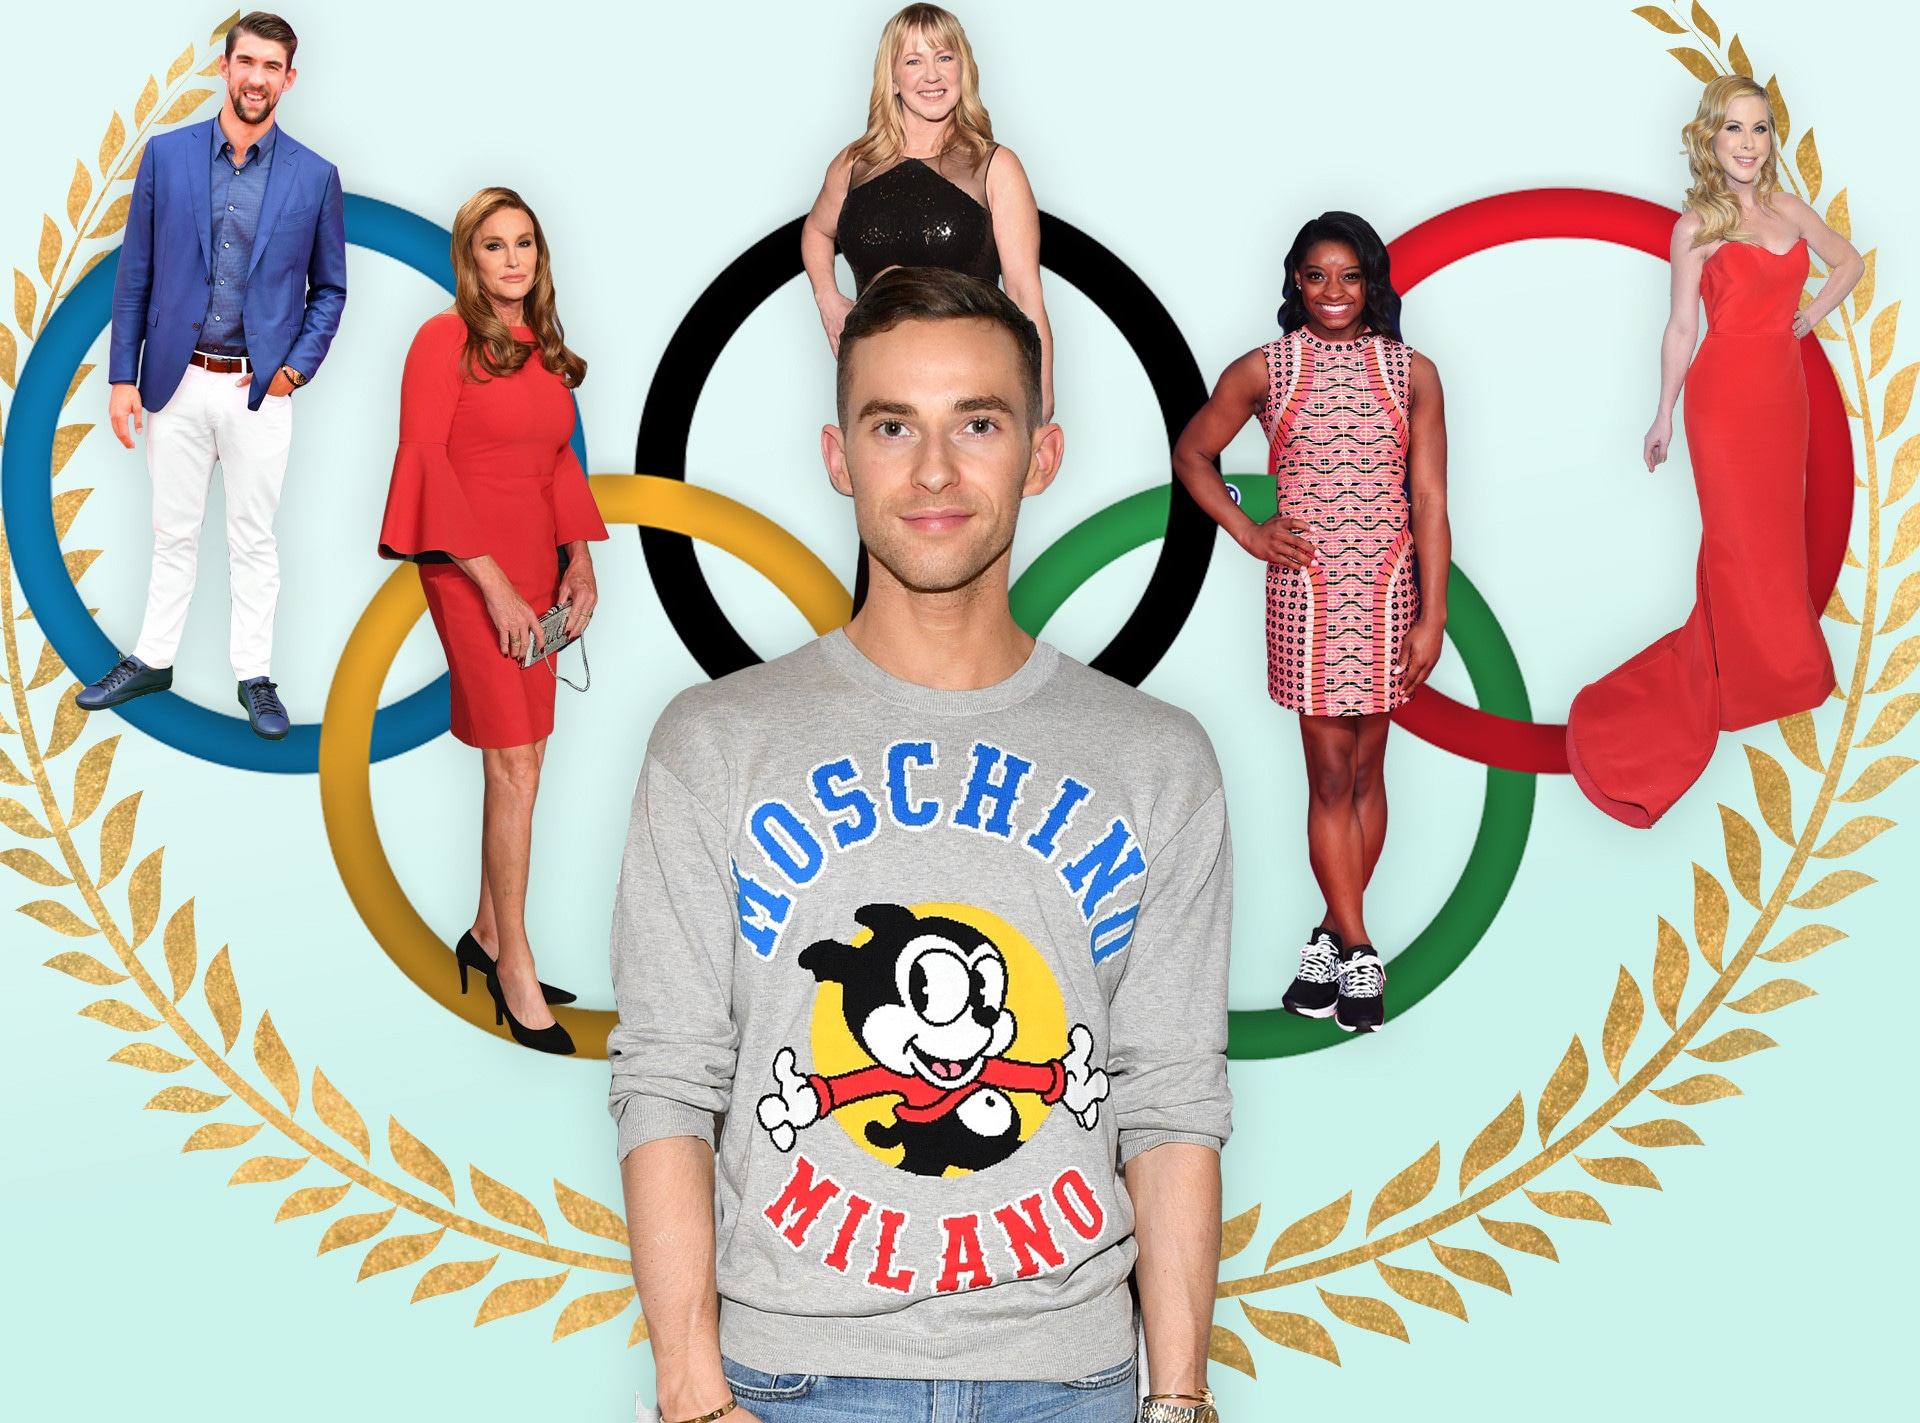 Shelf Life Of Olympians, Adam Rippon, Michael Phelps, Simone Biles, Caitlyn Jenner, Tara Lipinski, Tonya Harding